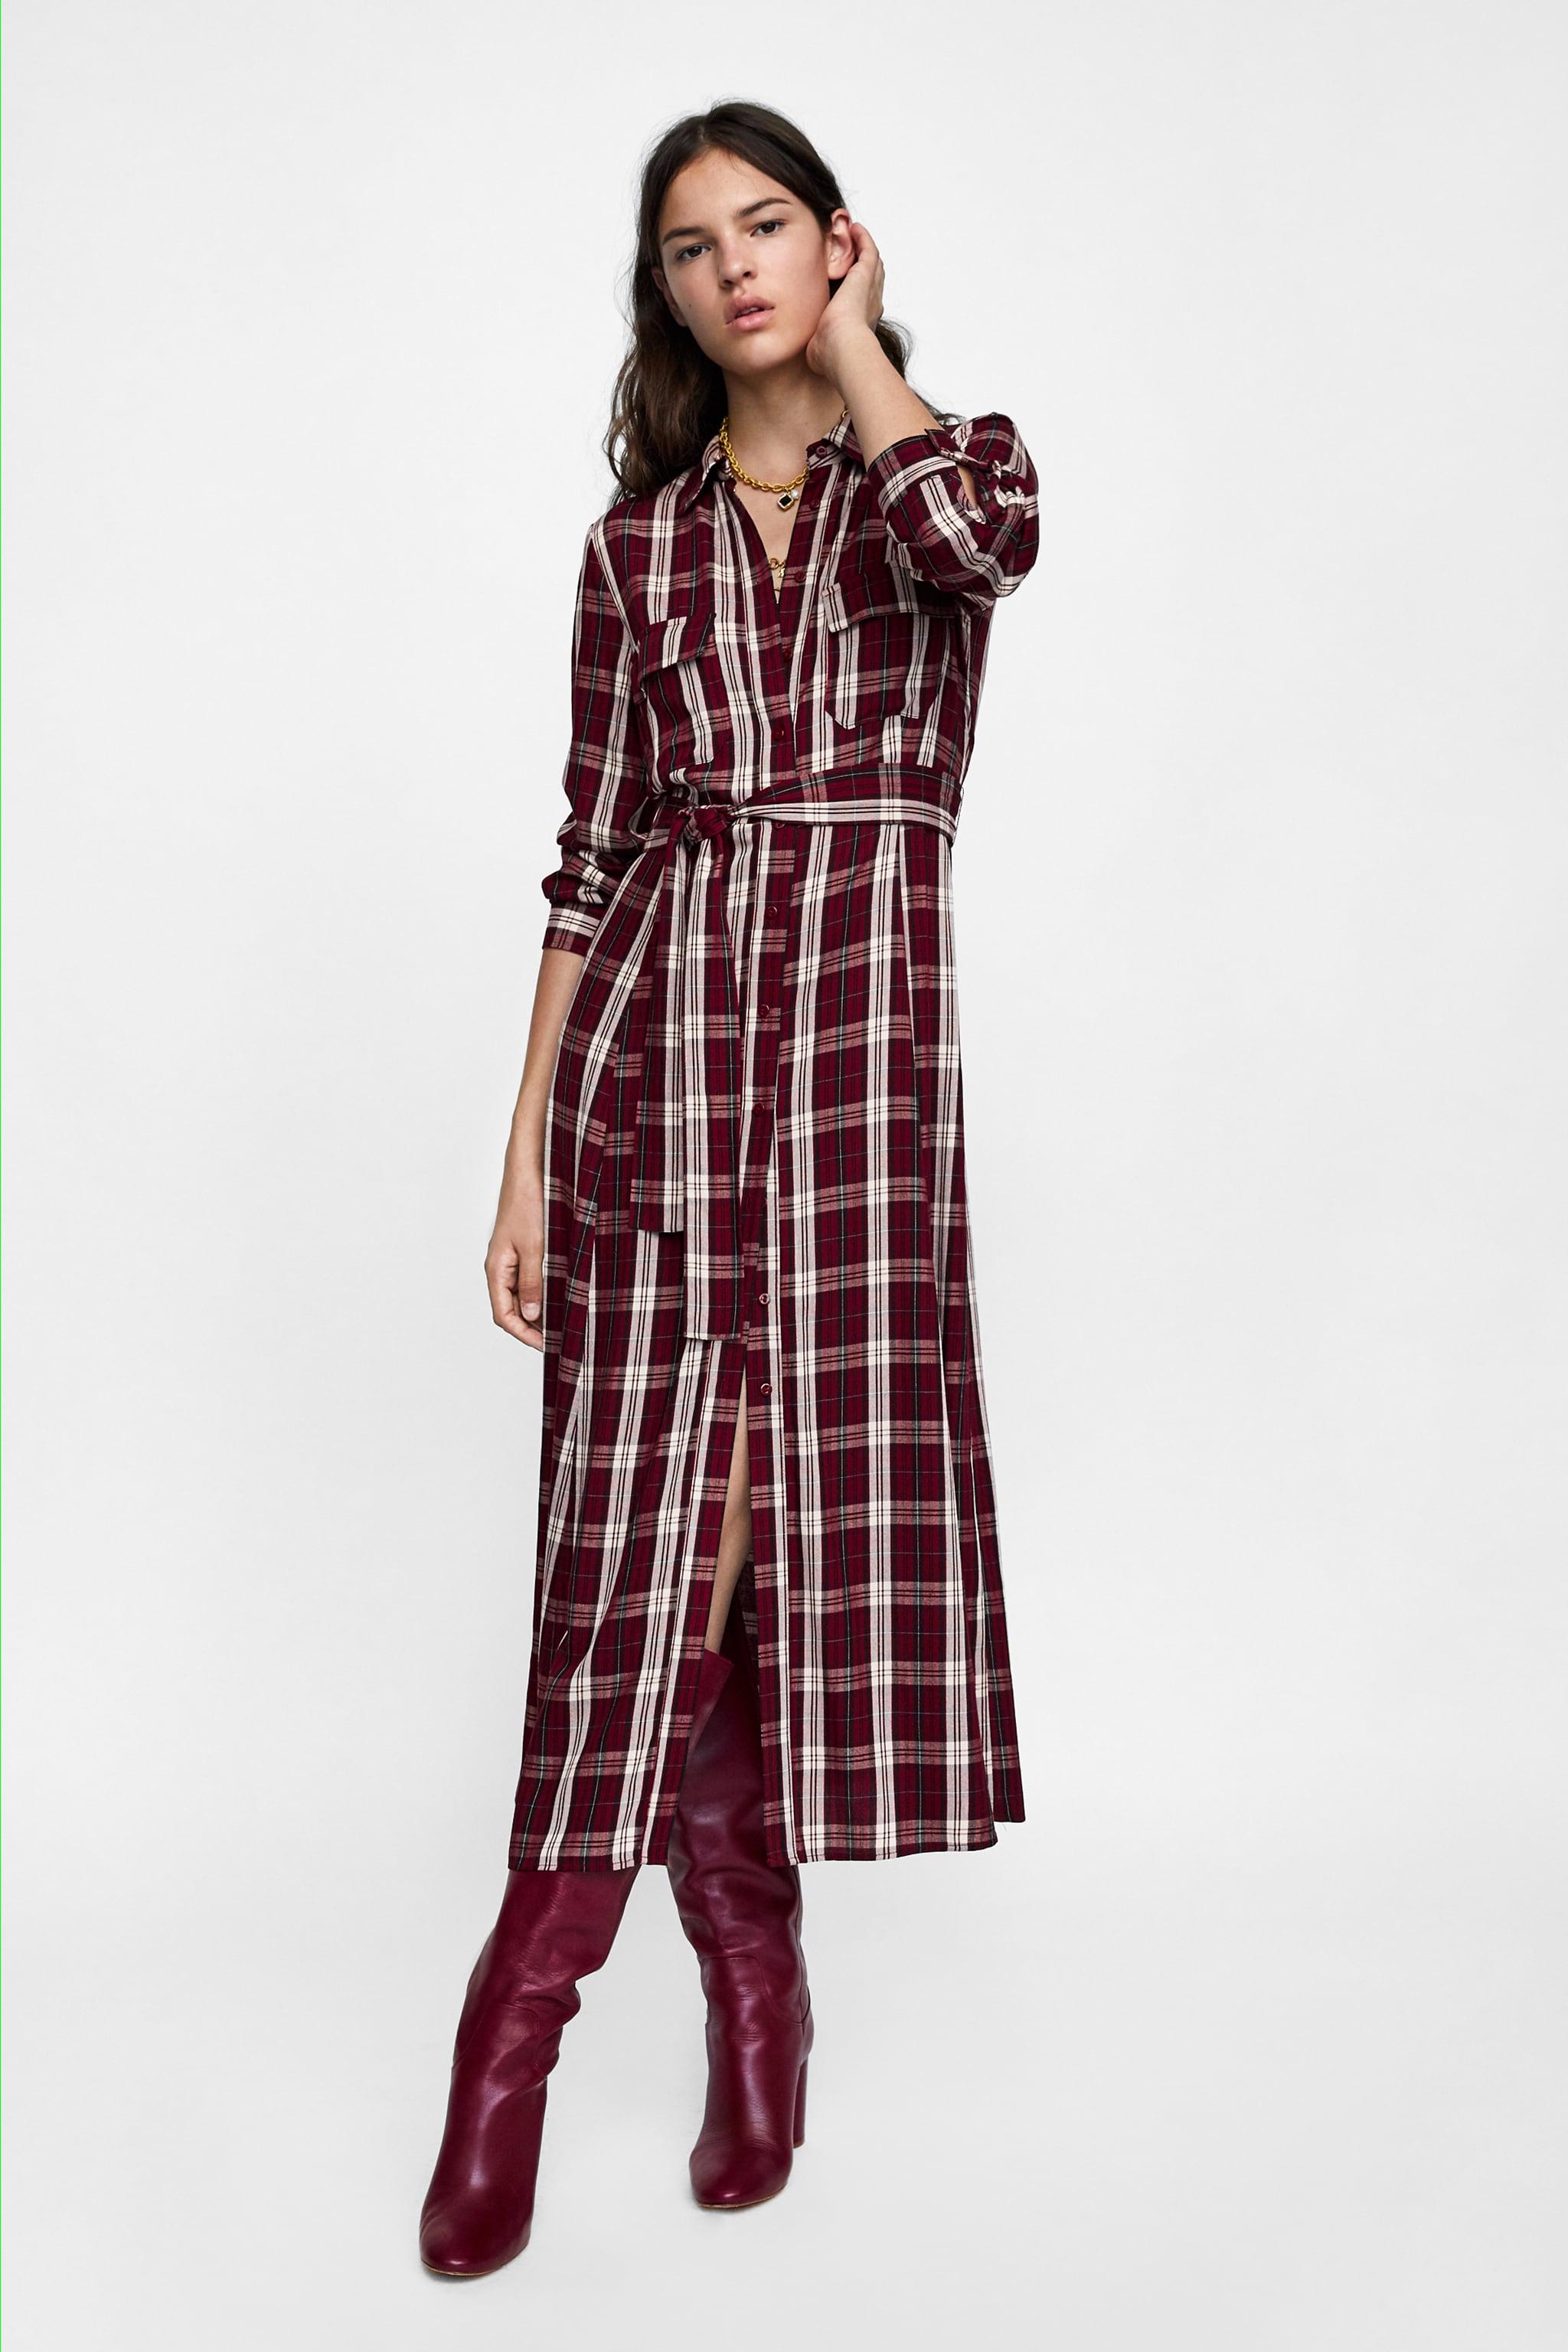 Tony Perotti Sandals Barclay Brown Cokelat Tua 41 Zara Long Checkered Dress